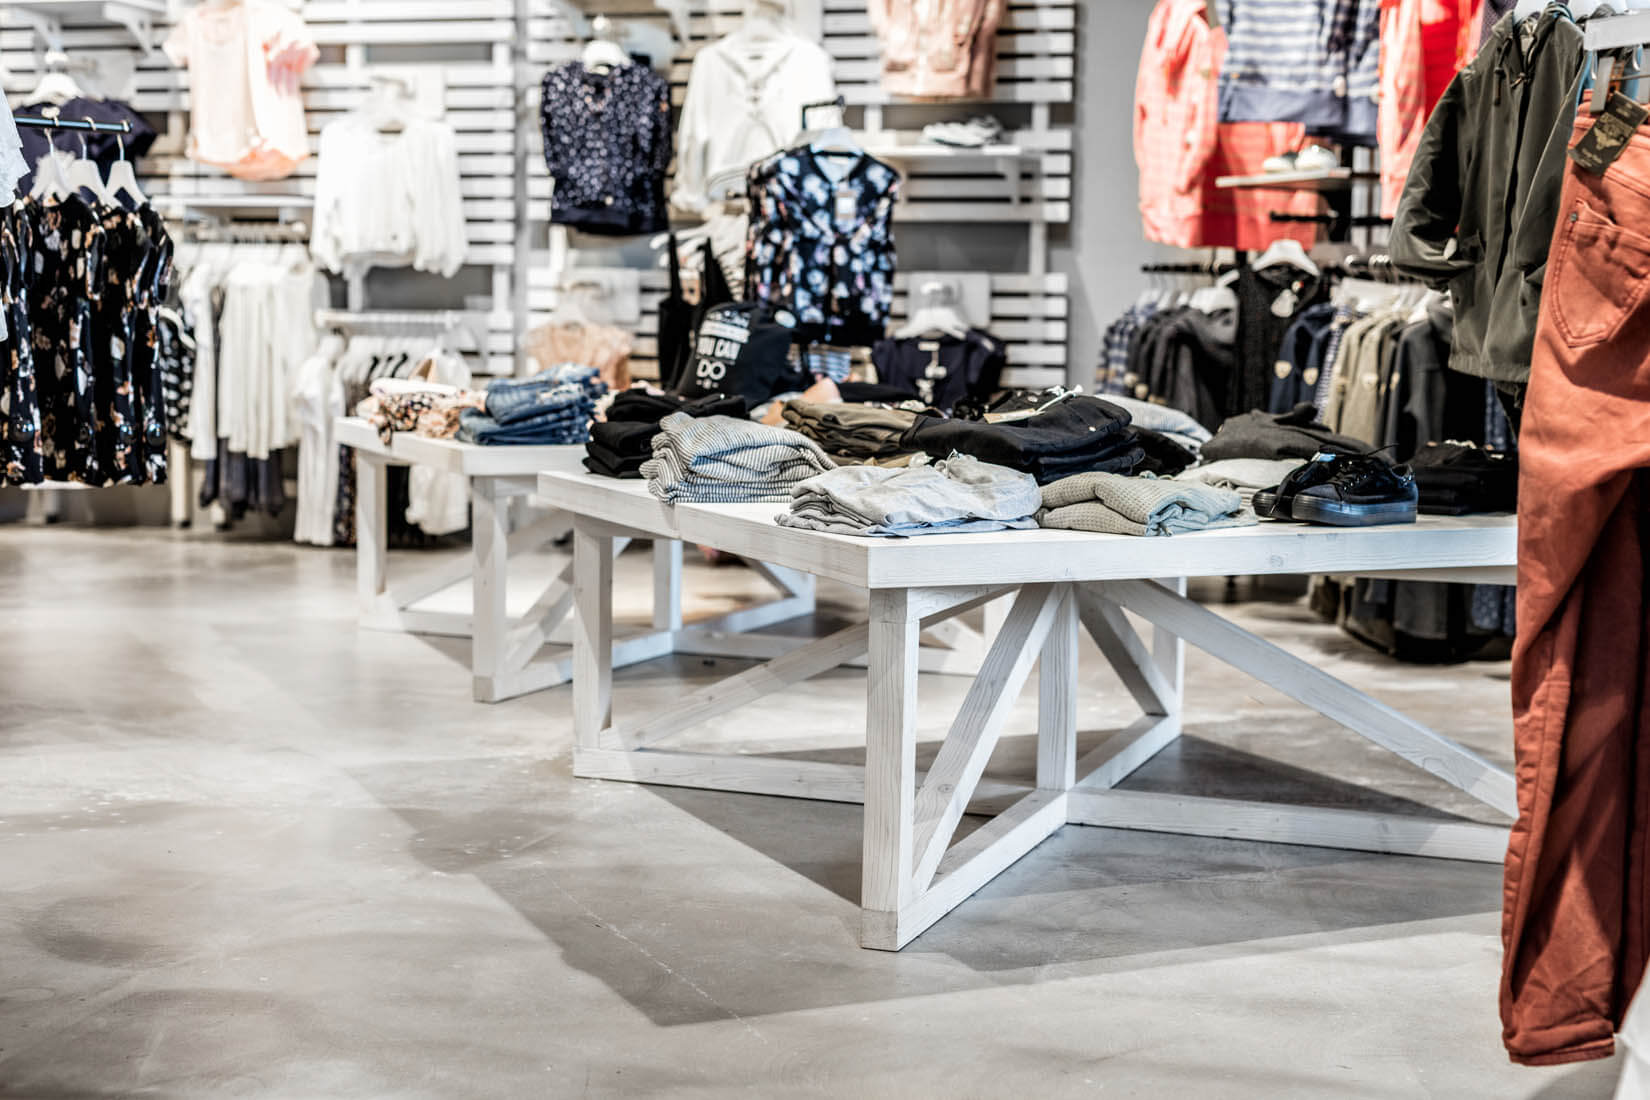 Innenaufnahmen  KULT Store  Sdpark Klagenfurt